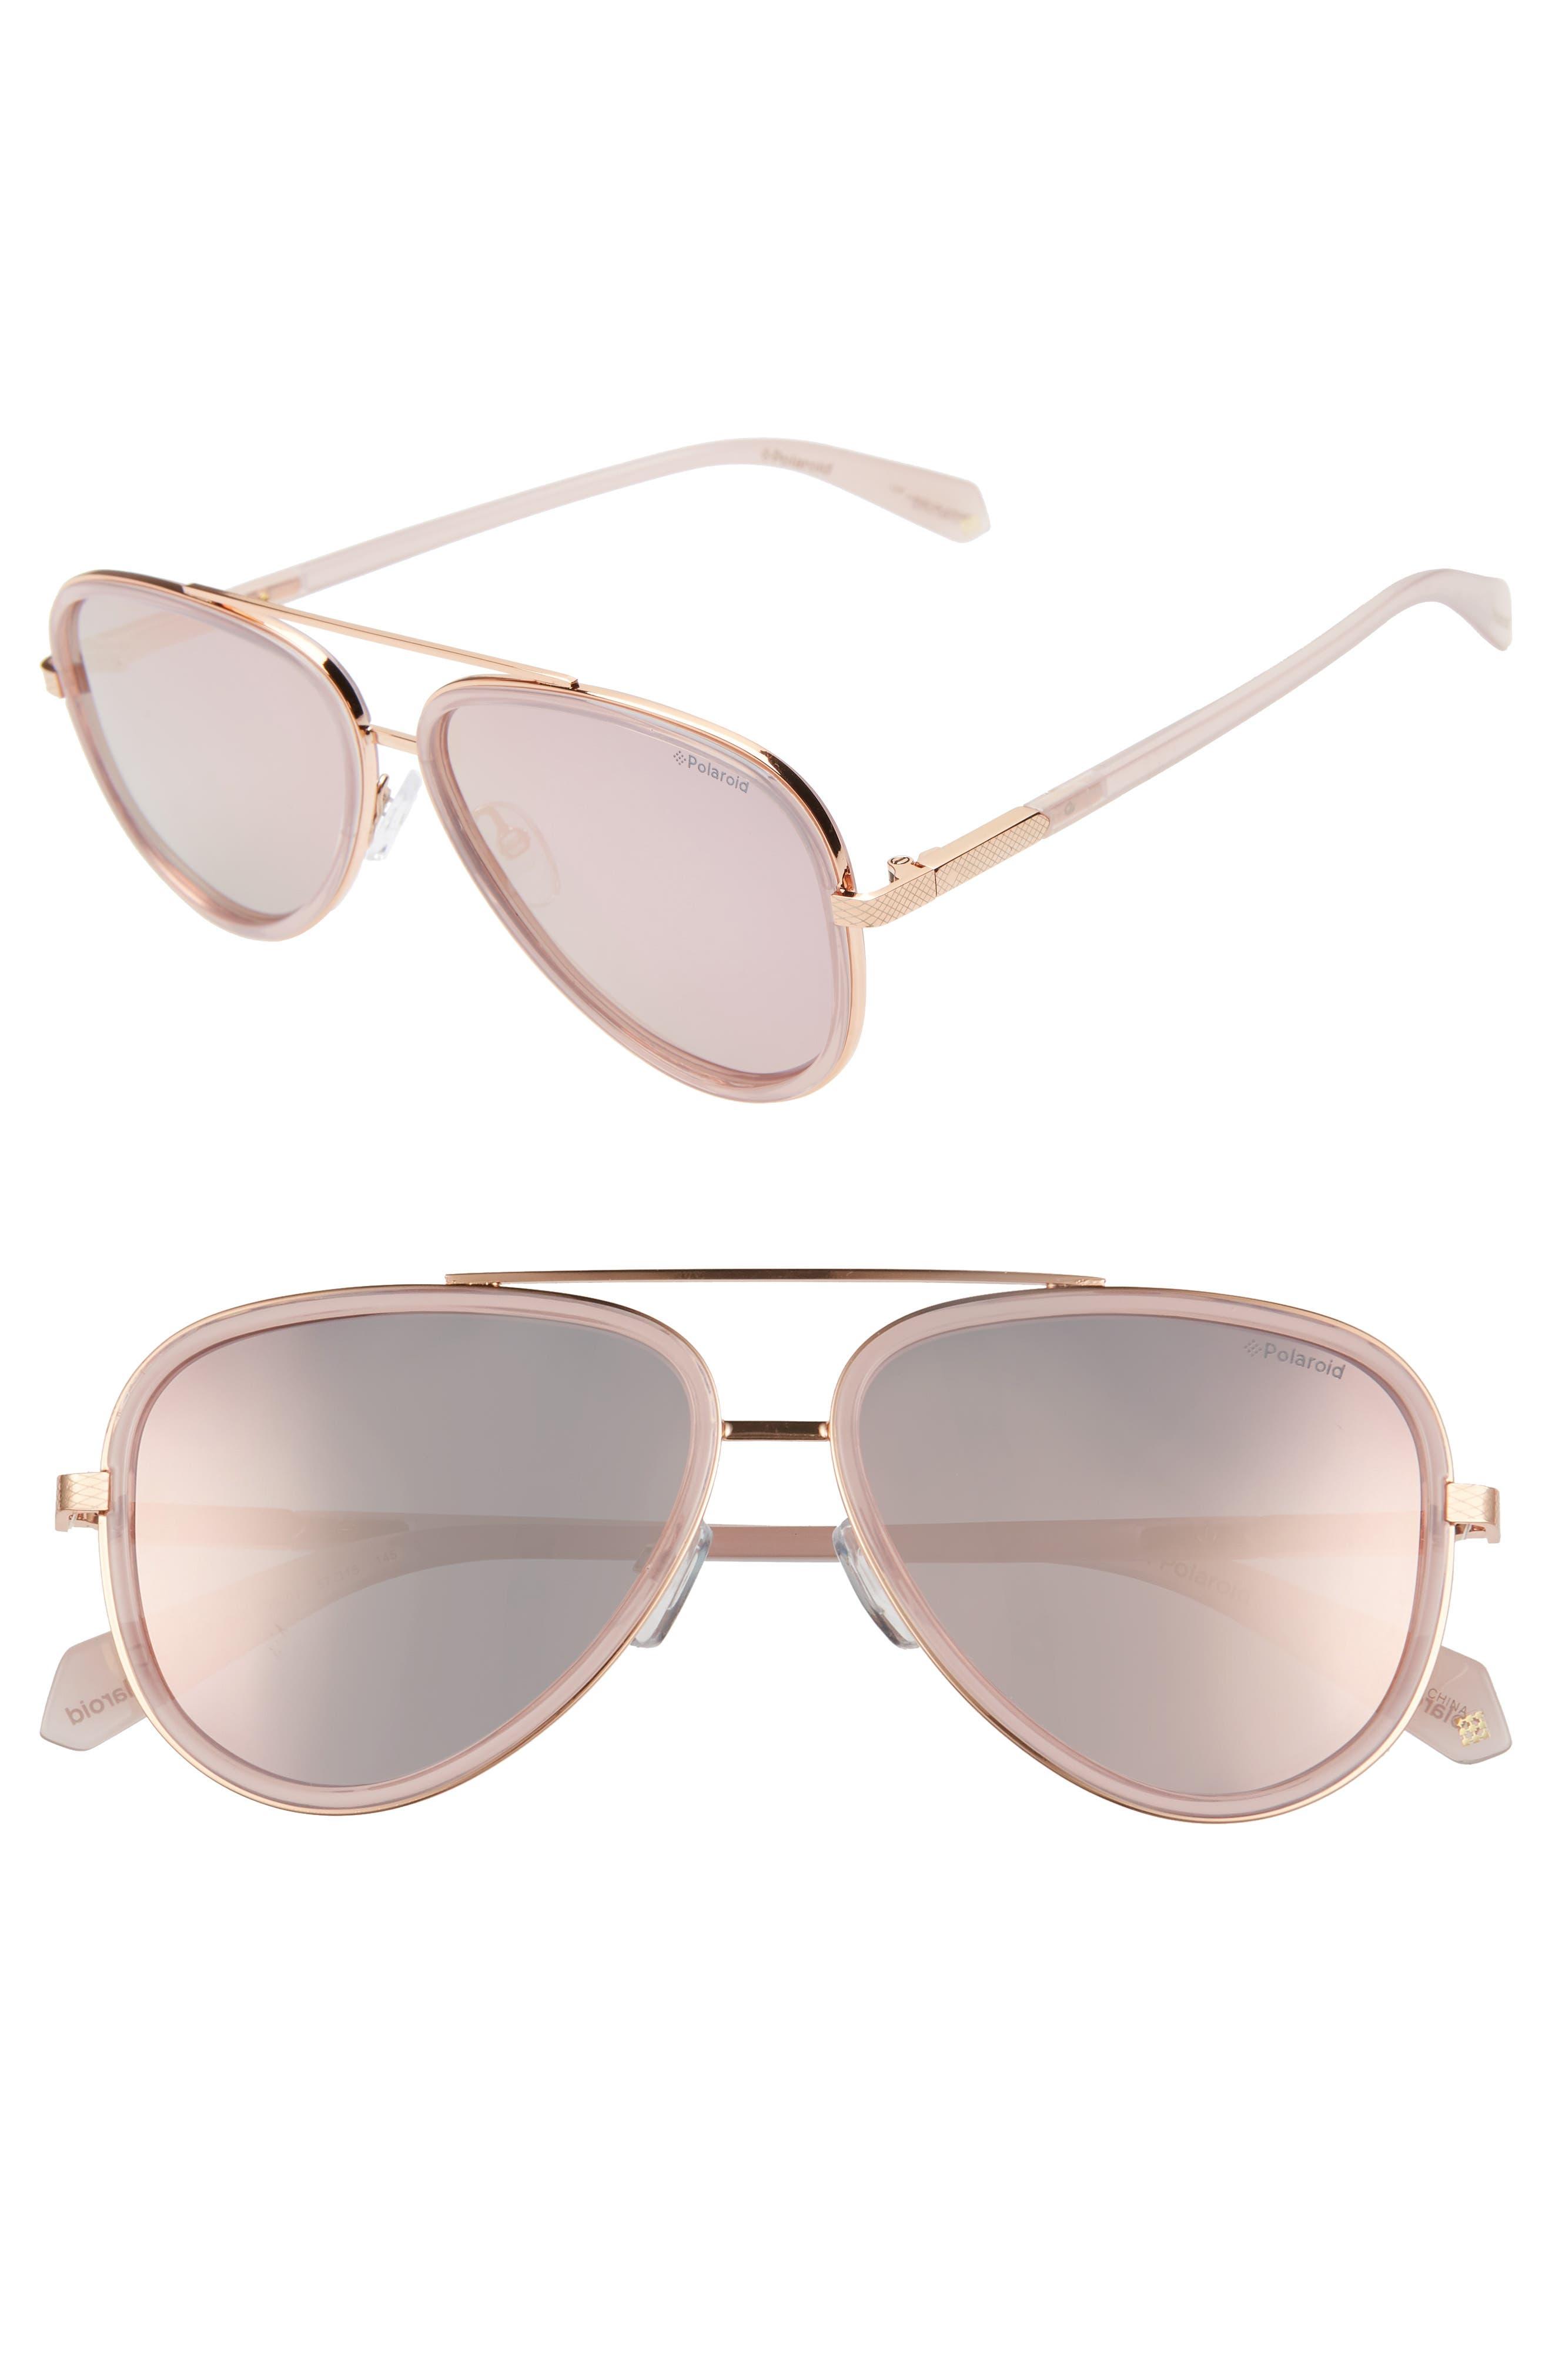 Polaroid 60Mm Polarized Round Aviator Sunglasses - Gold/ Pink